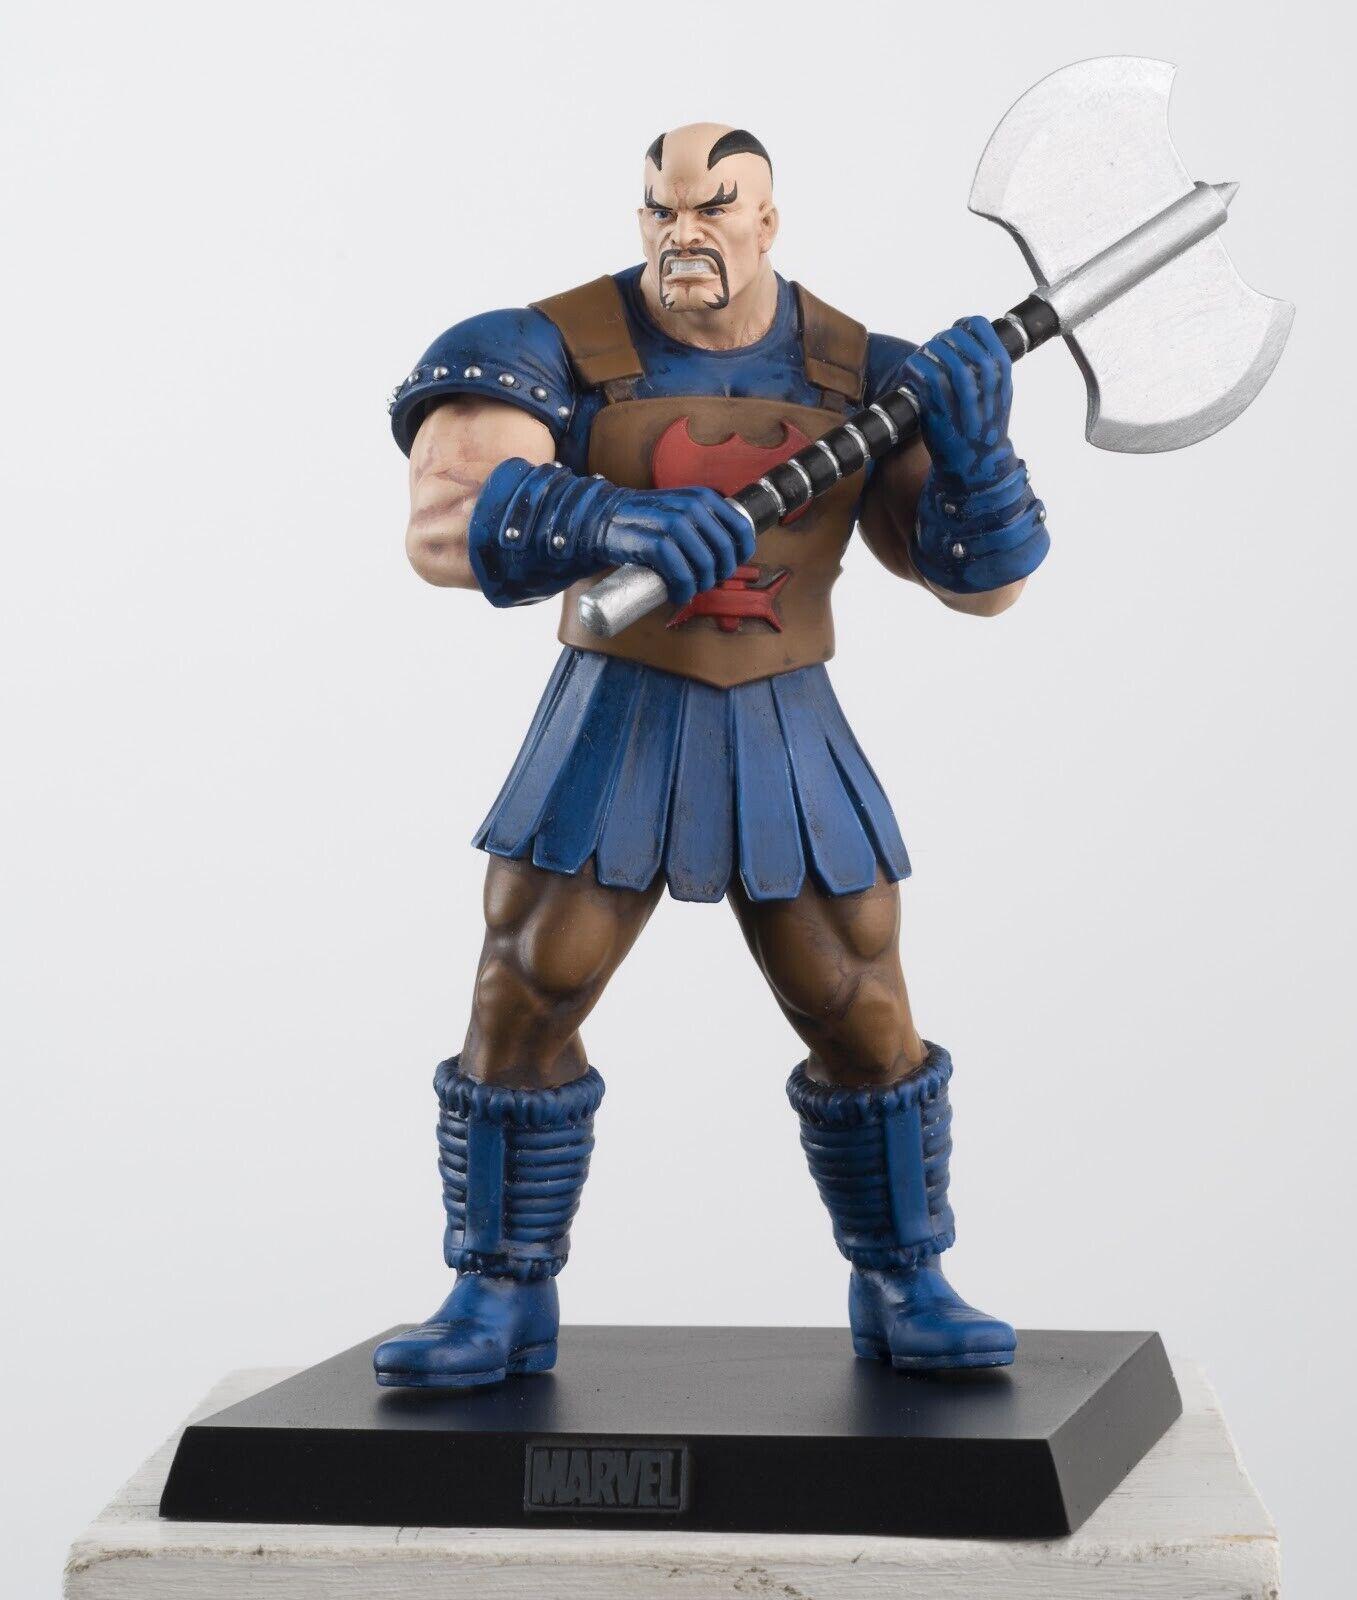 Eaglemoss Supereroi Marvel Vendicatori SKURGE Statuina Piombo MIB, 2013